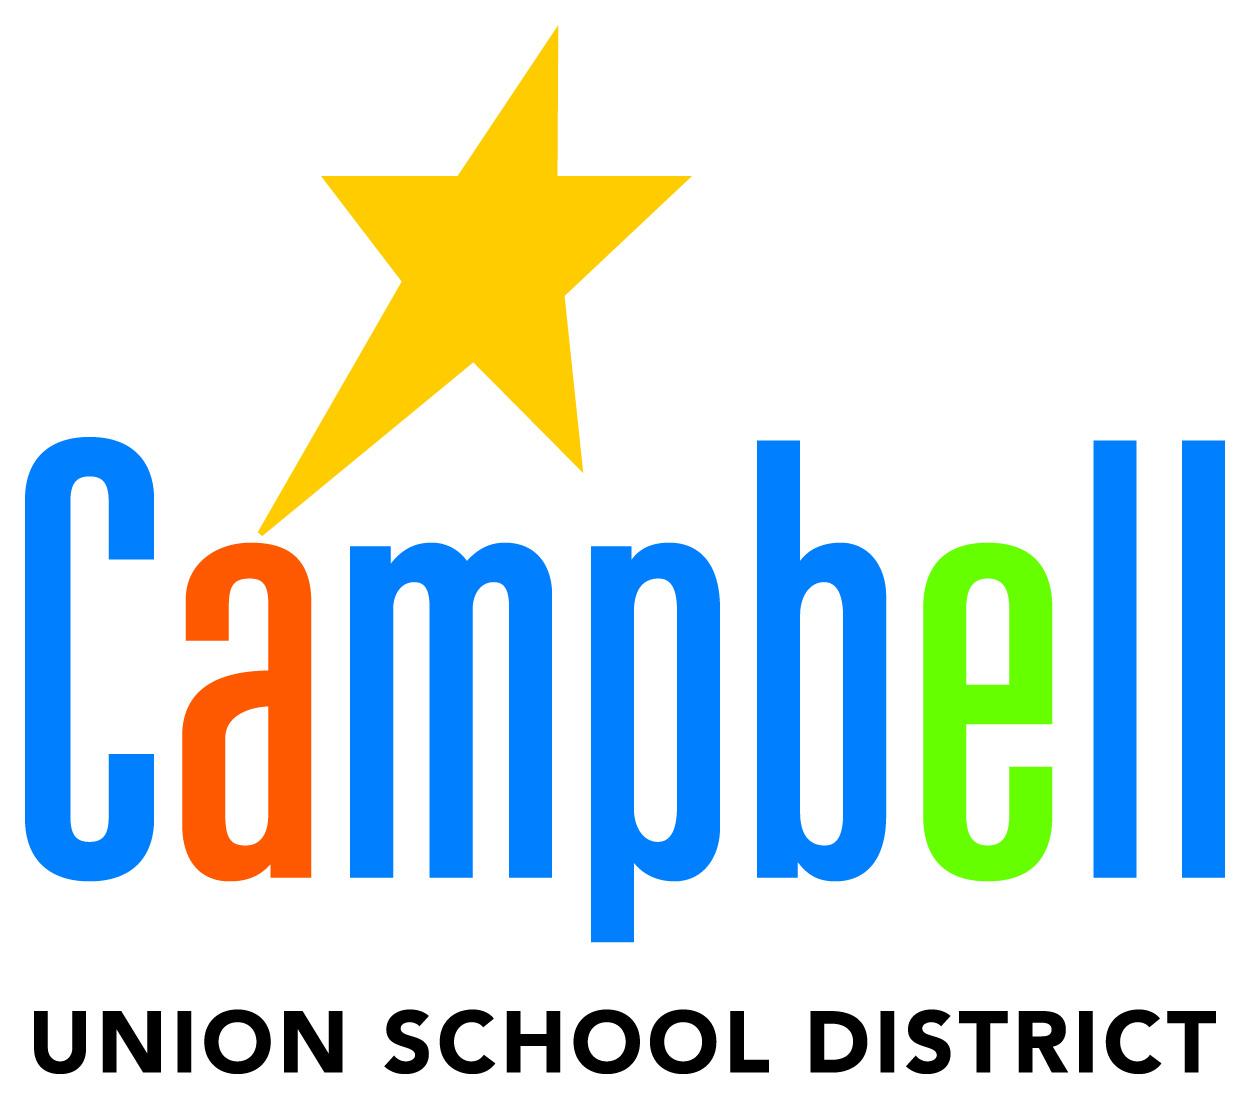 Campbell Union School District logo